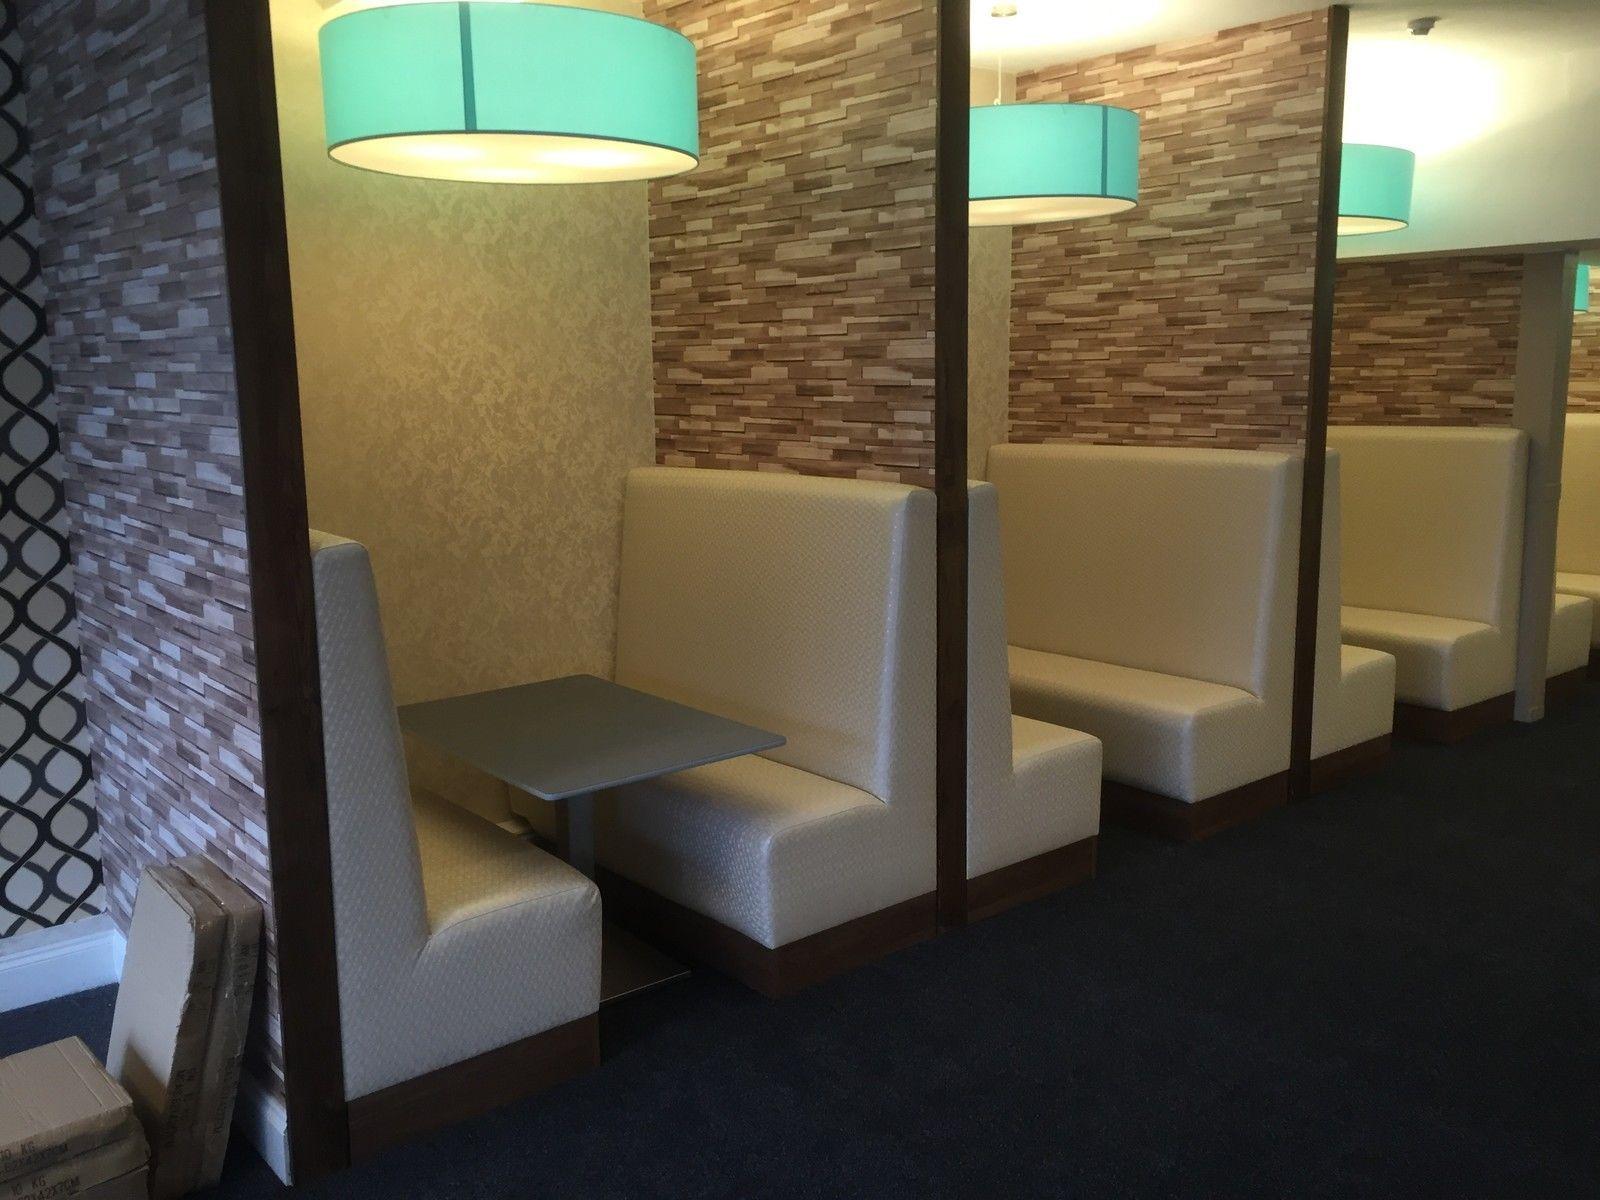 Restaurant Bar Nightclub And Booth Seating